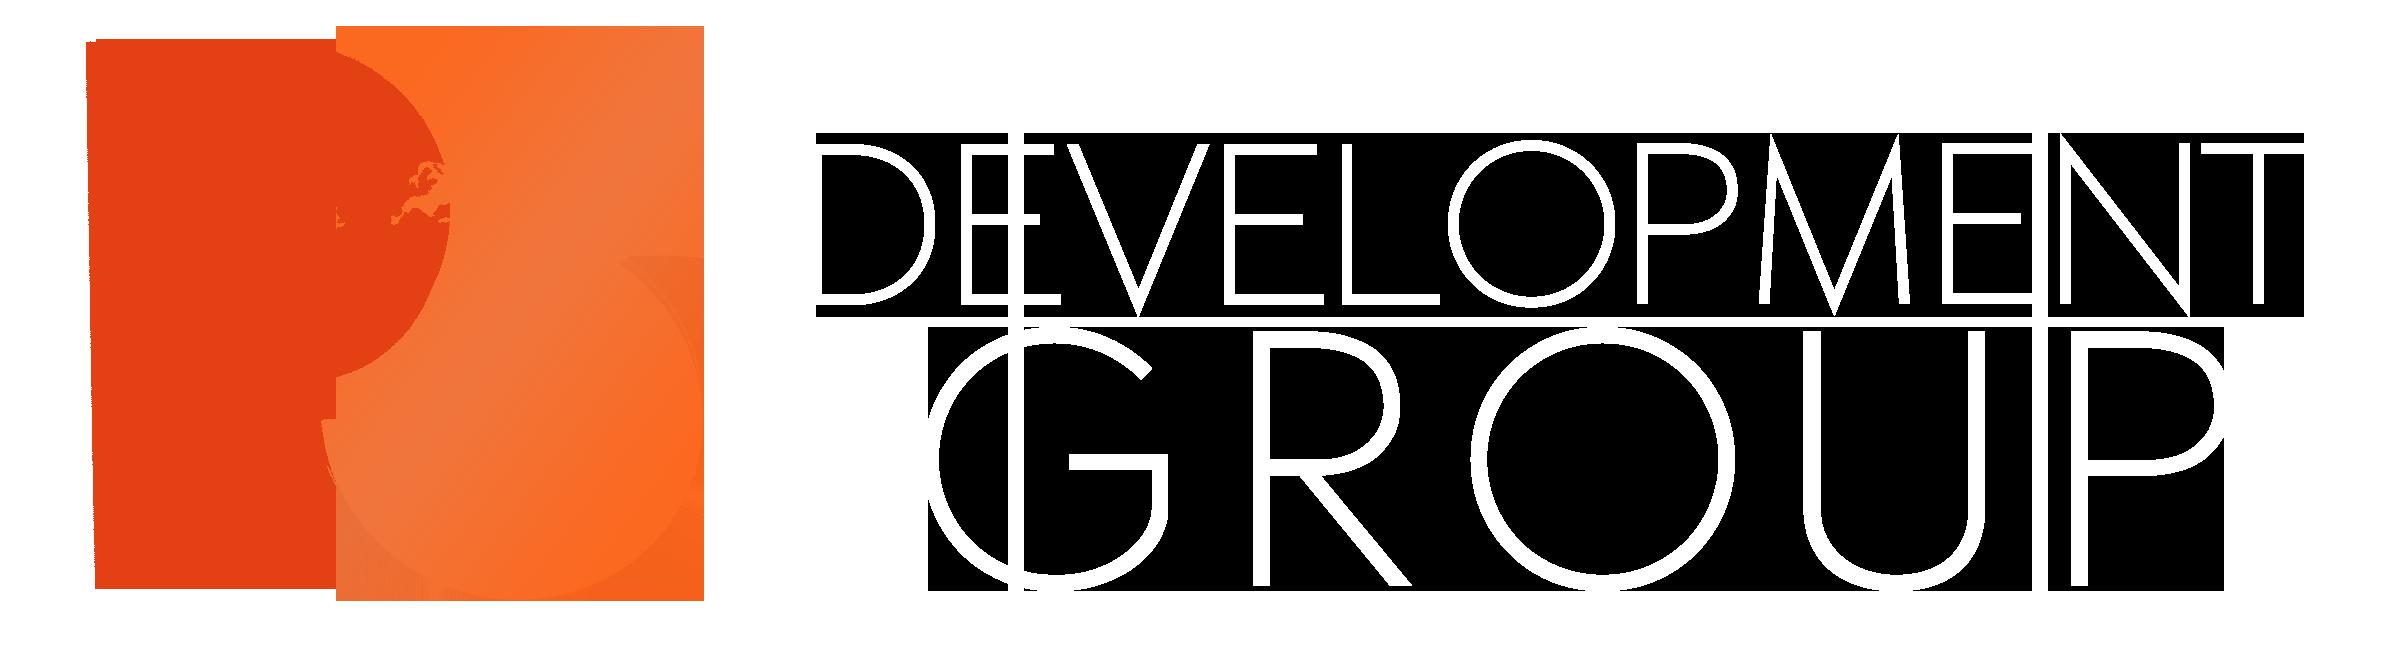 P3-Development-Group-white-900px